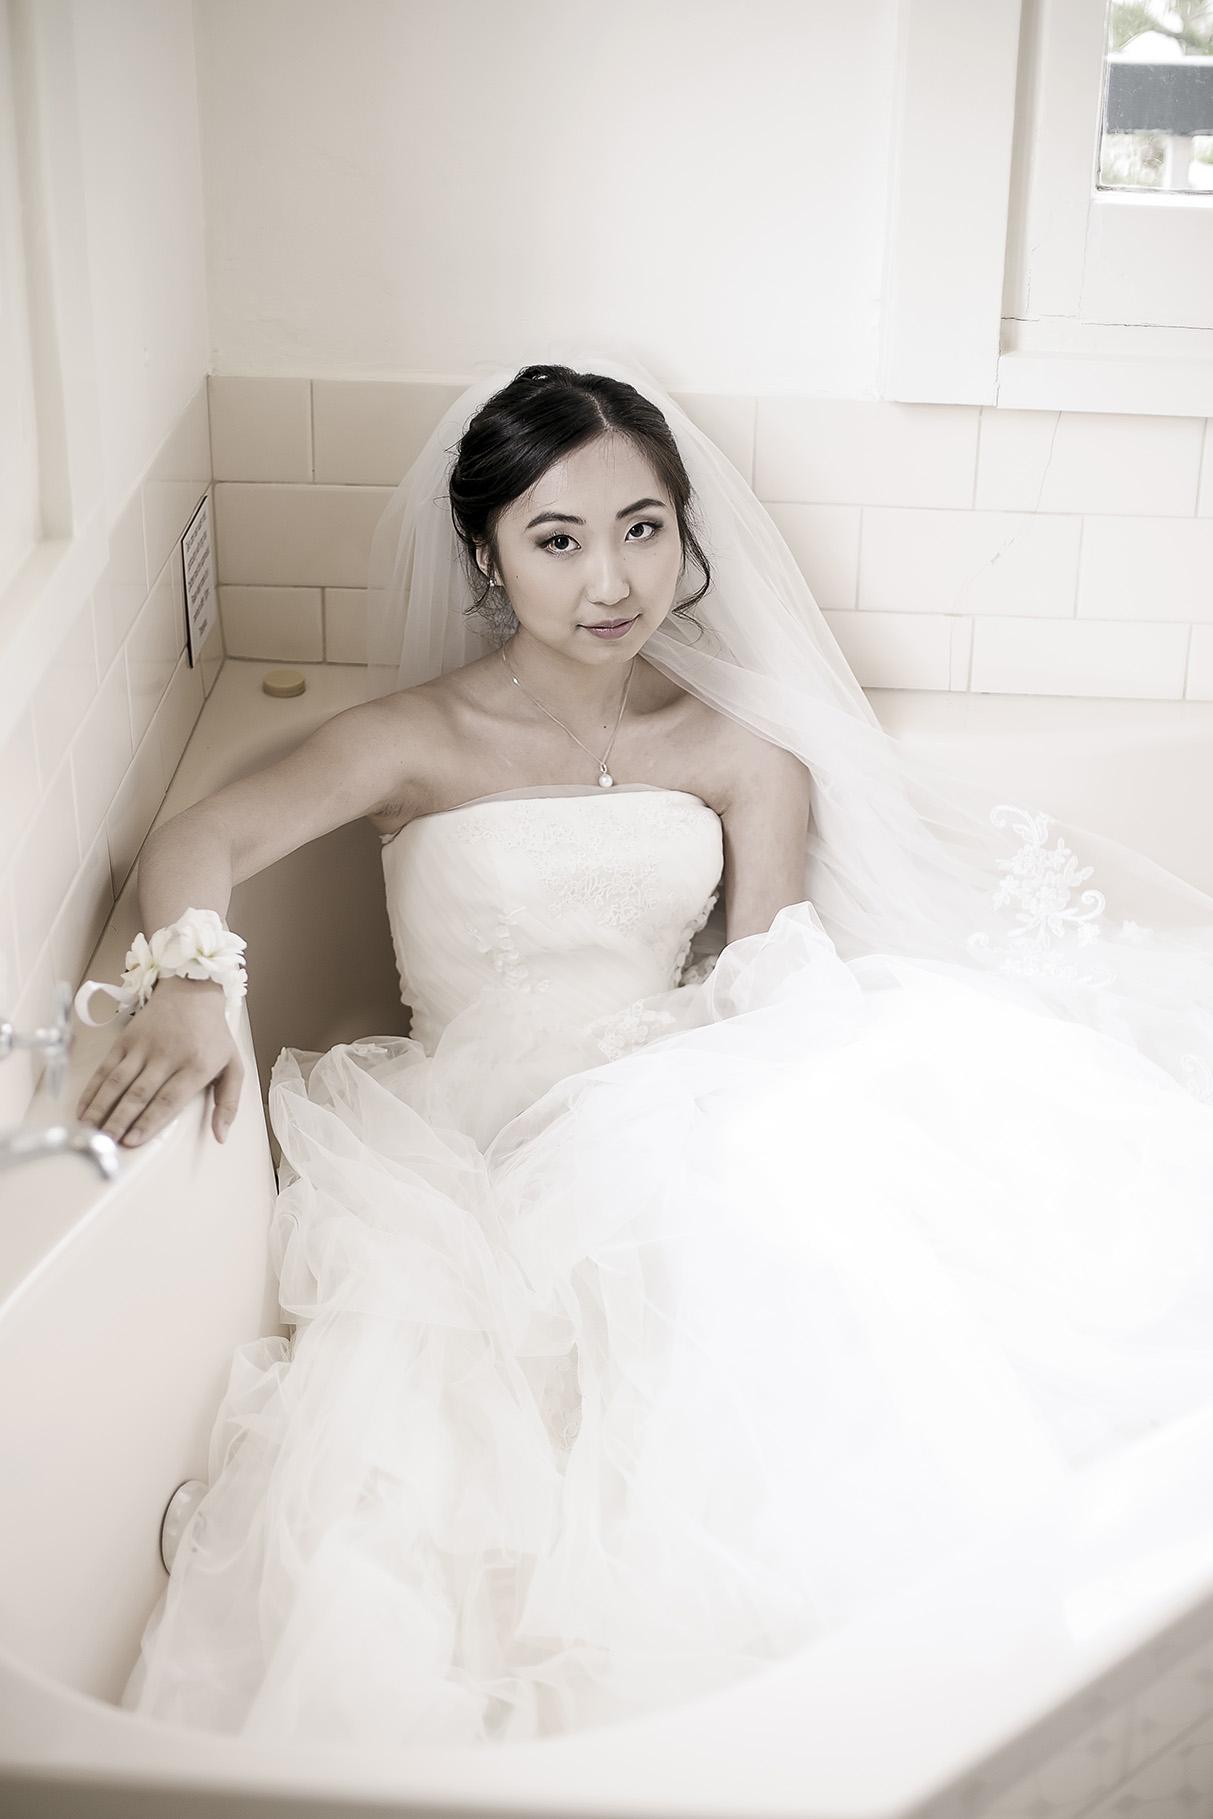 Sepia Bridal Preparation photo in spa bath 1